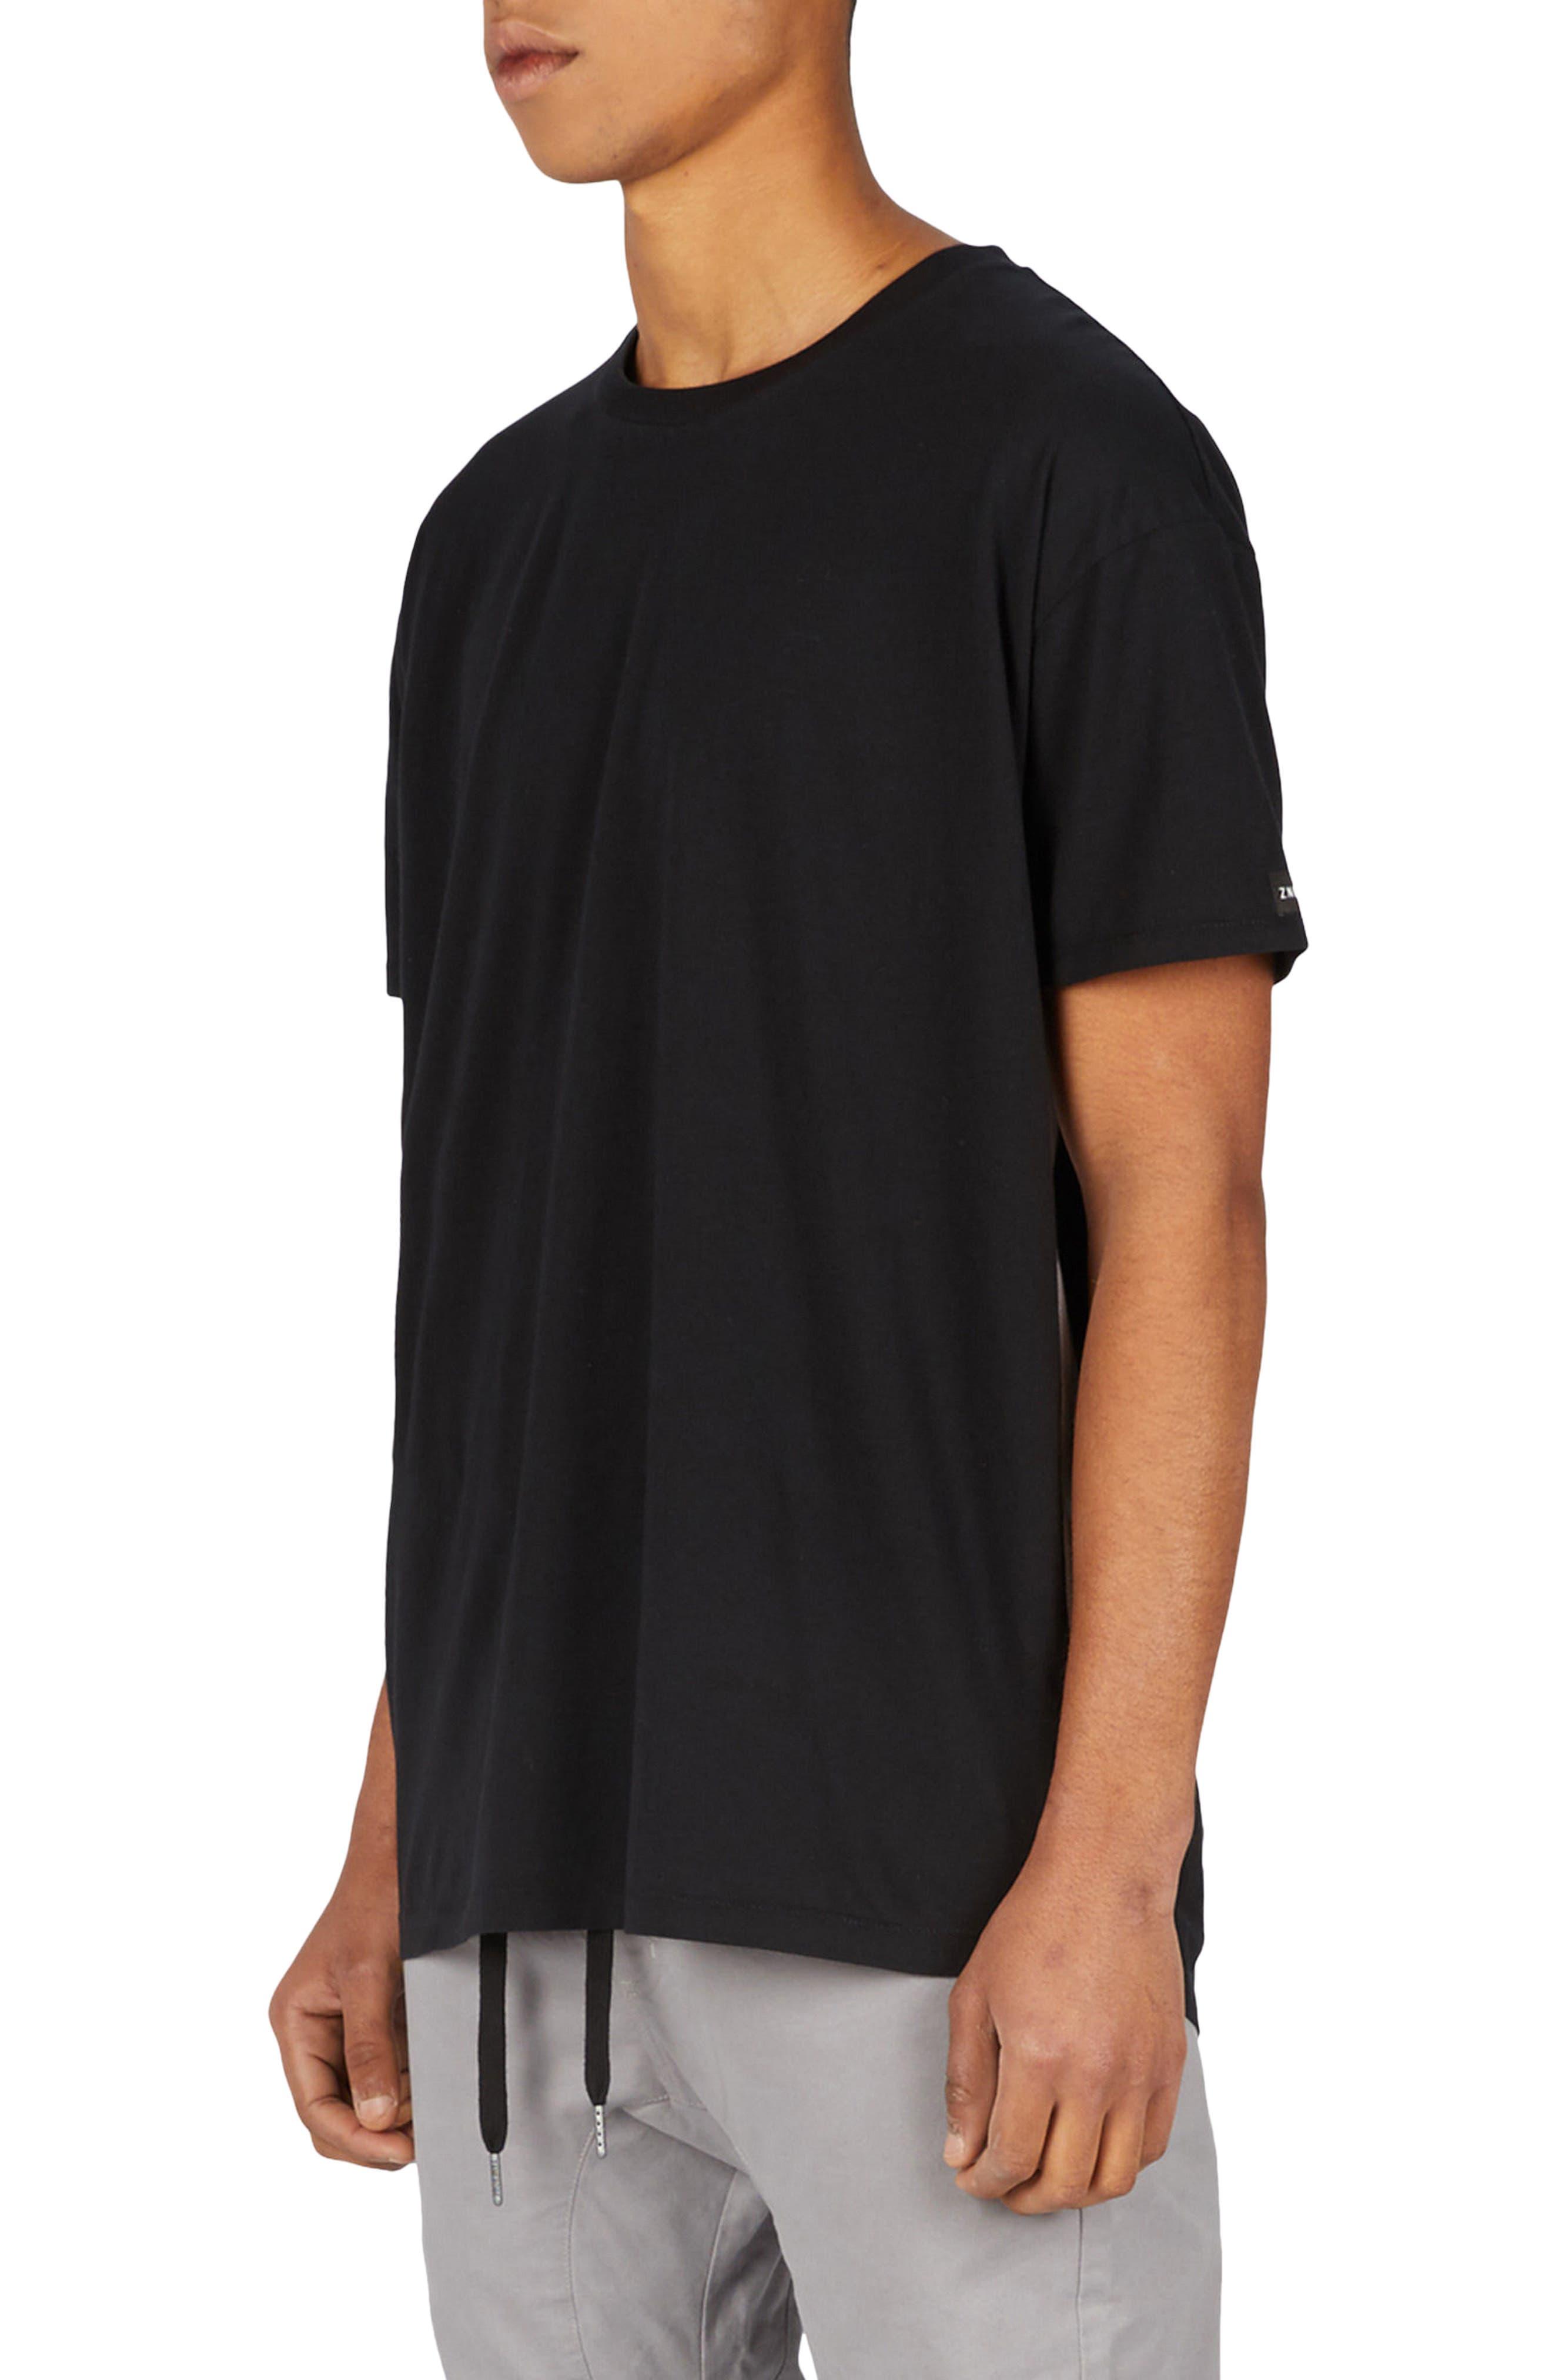 Sideline Rugger T-Shirt,                             Main thumbnail 1, color,                             BLACK